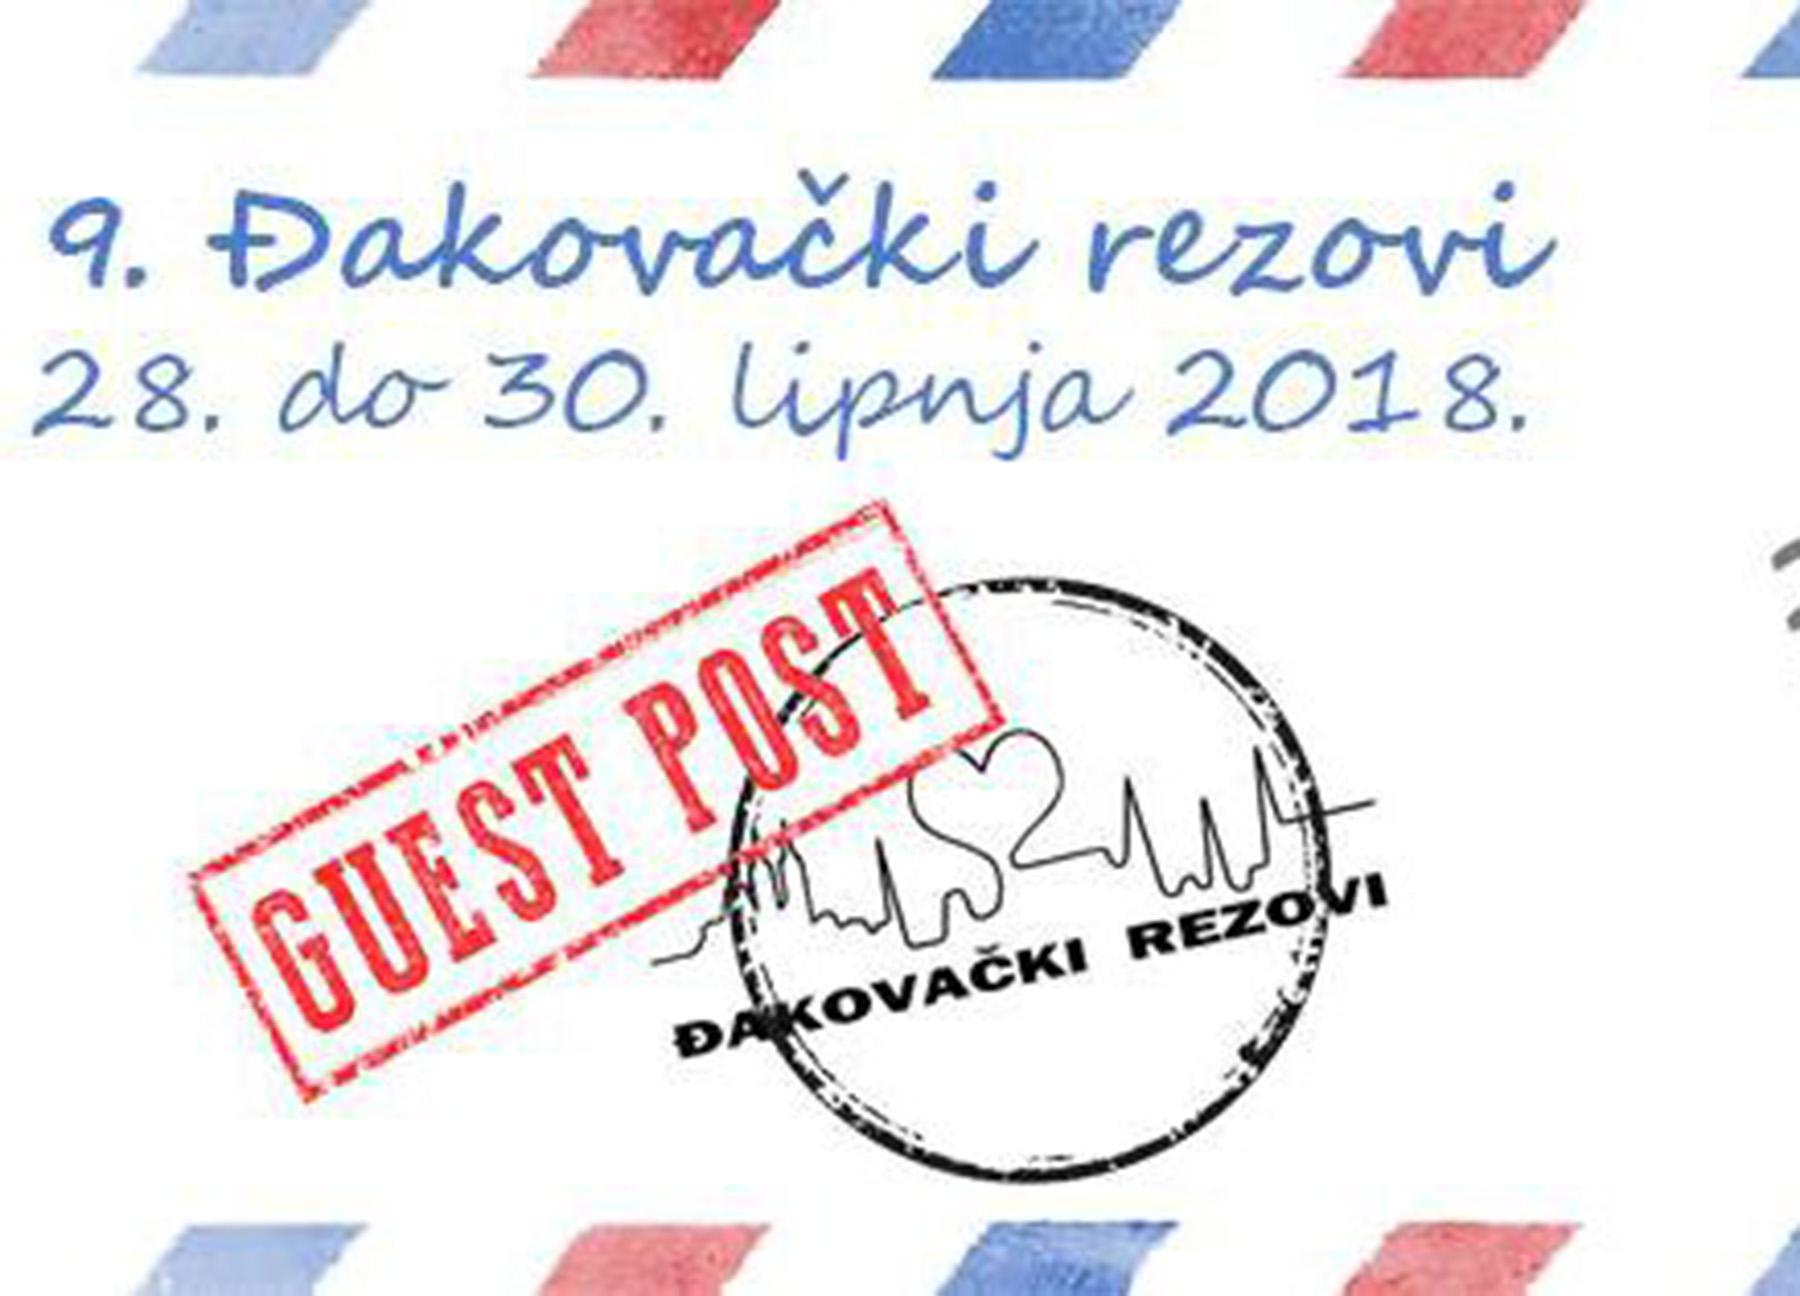 ĐAKOVAČKI REZOVI – ETNO FILM FESTIVAL 2018. – otvaranje